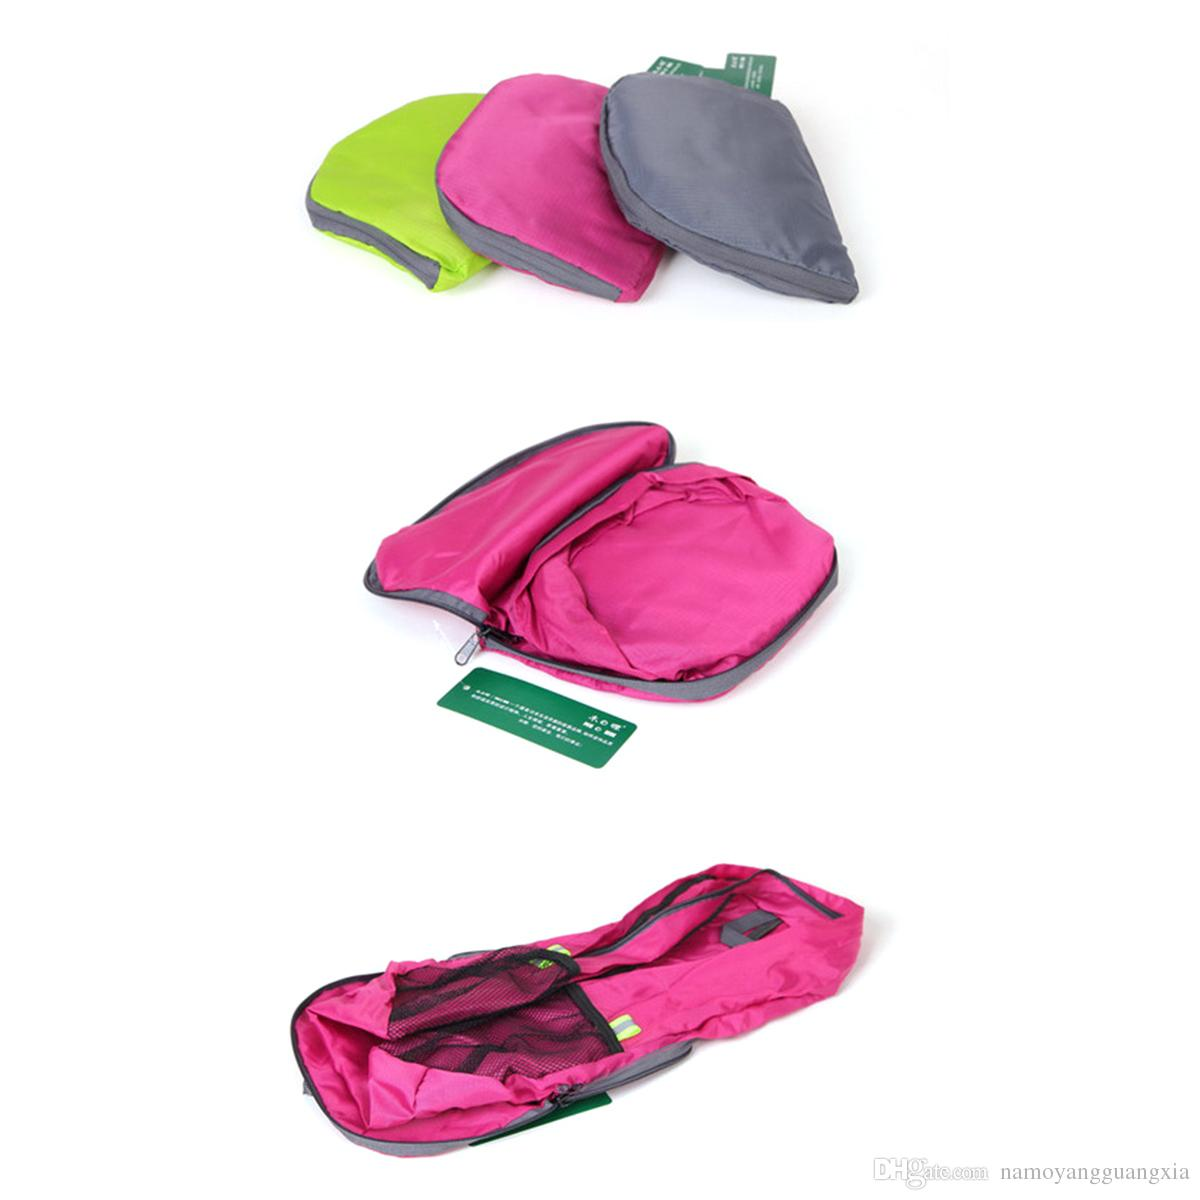 Lightweight Foldable Waterproof Women Men Children Skin Pack Backpack Travel Outdoor Sports Camping Hiking Bag Rucksack